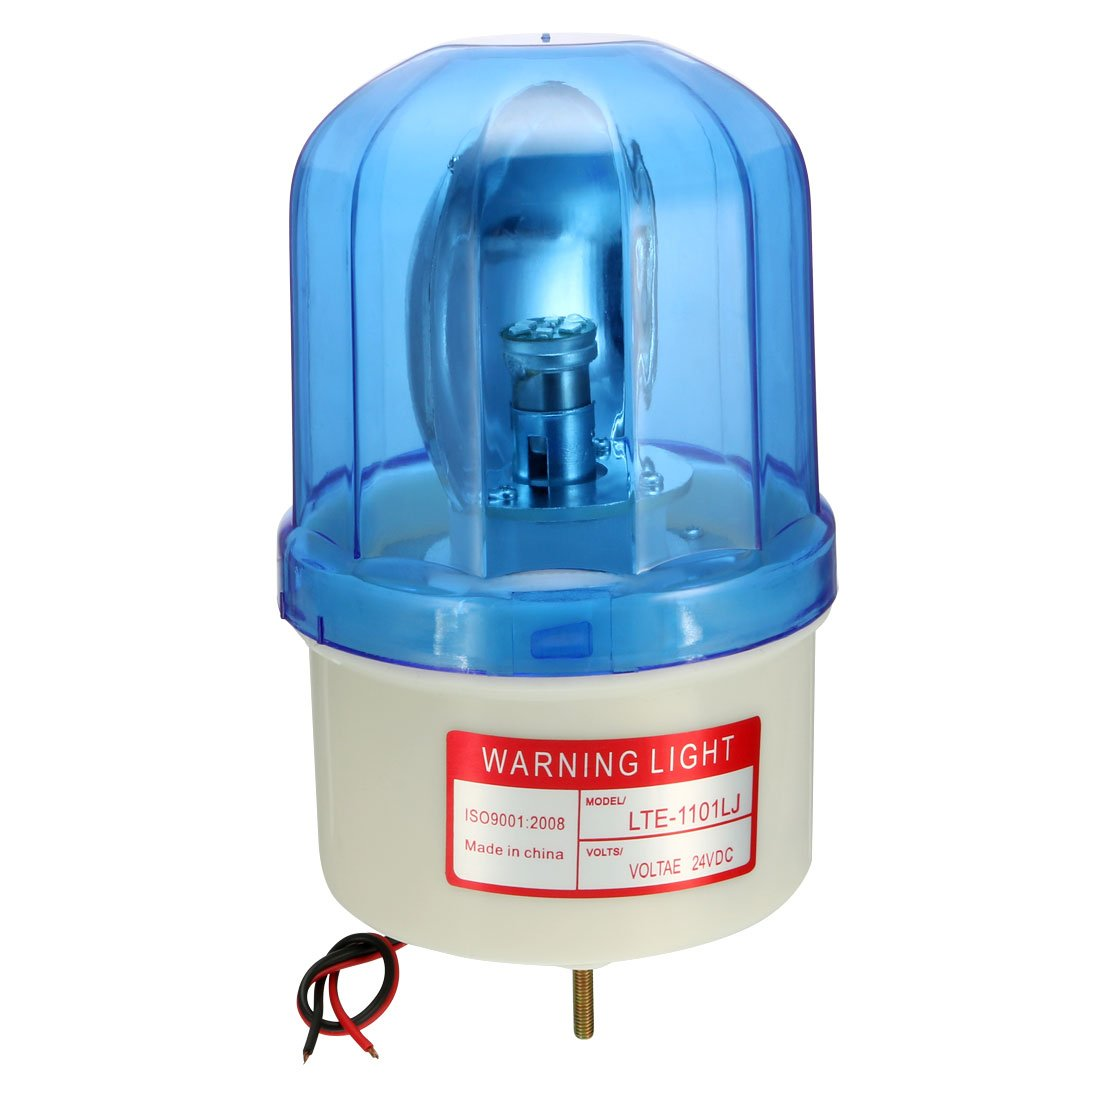 uxcell® LED Warning Light Bulb Rotating Signal Alarm Lamp Buzzer 90dB DC 24V Blue LTE1101LJ a18042400ux0114